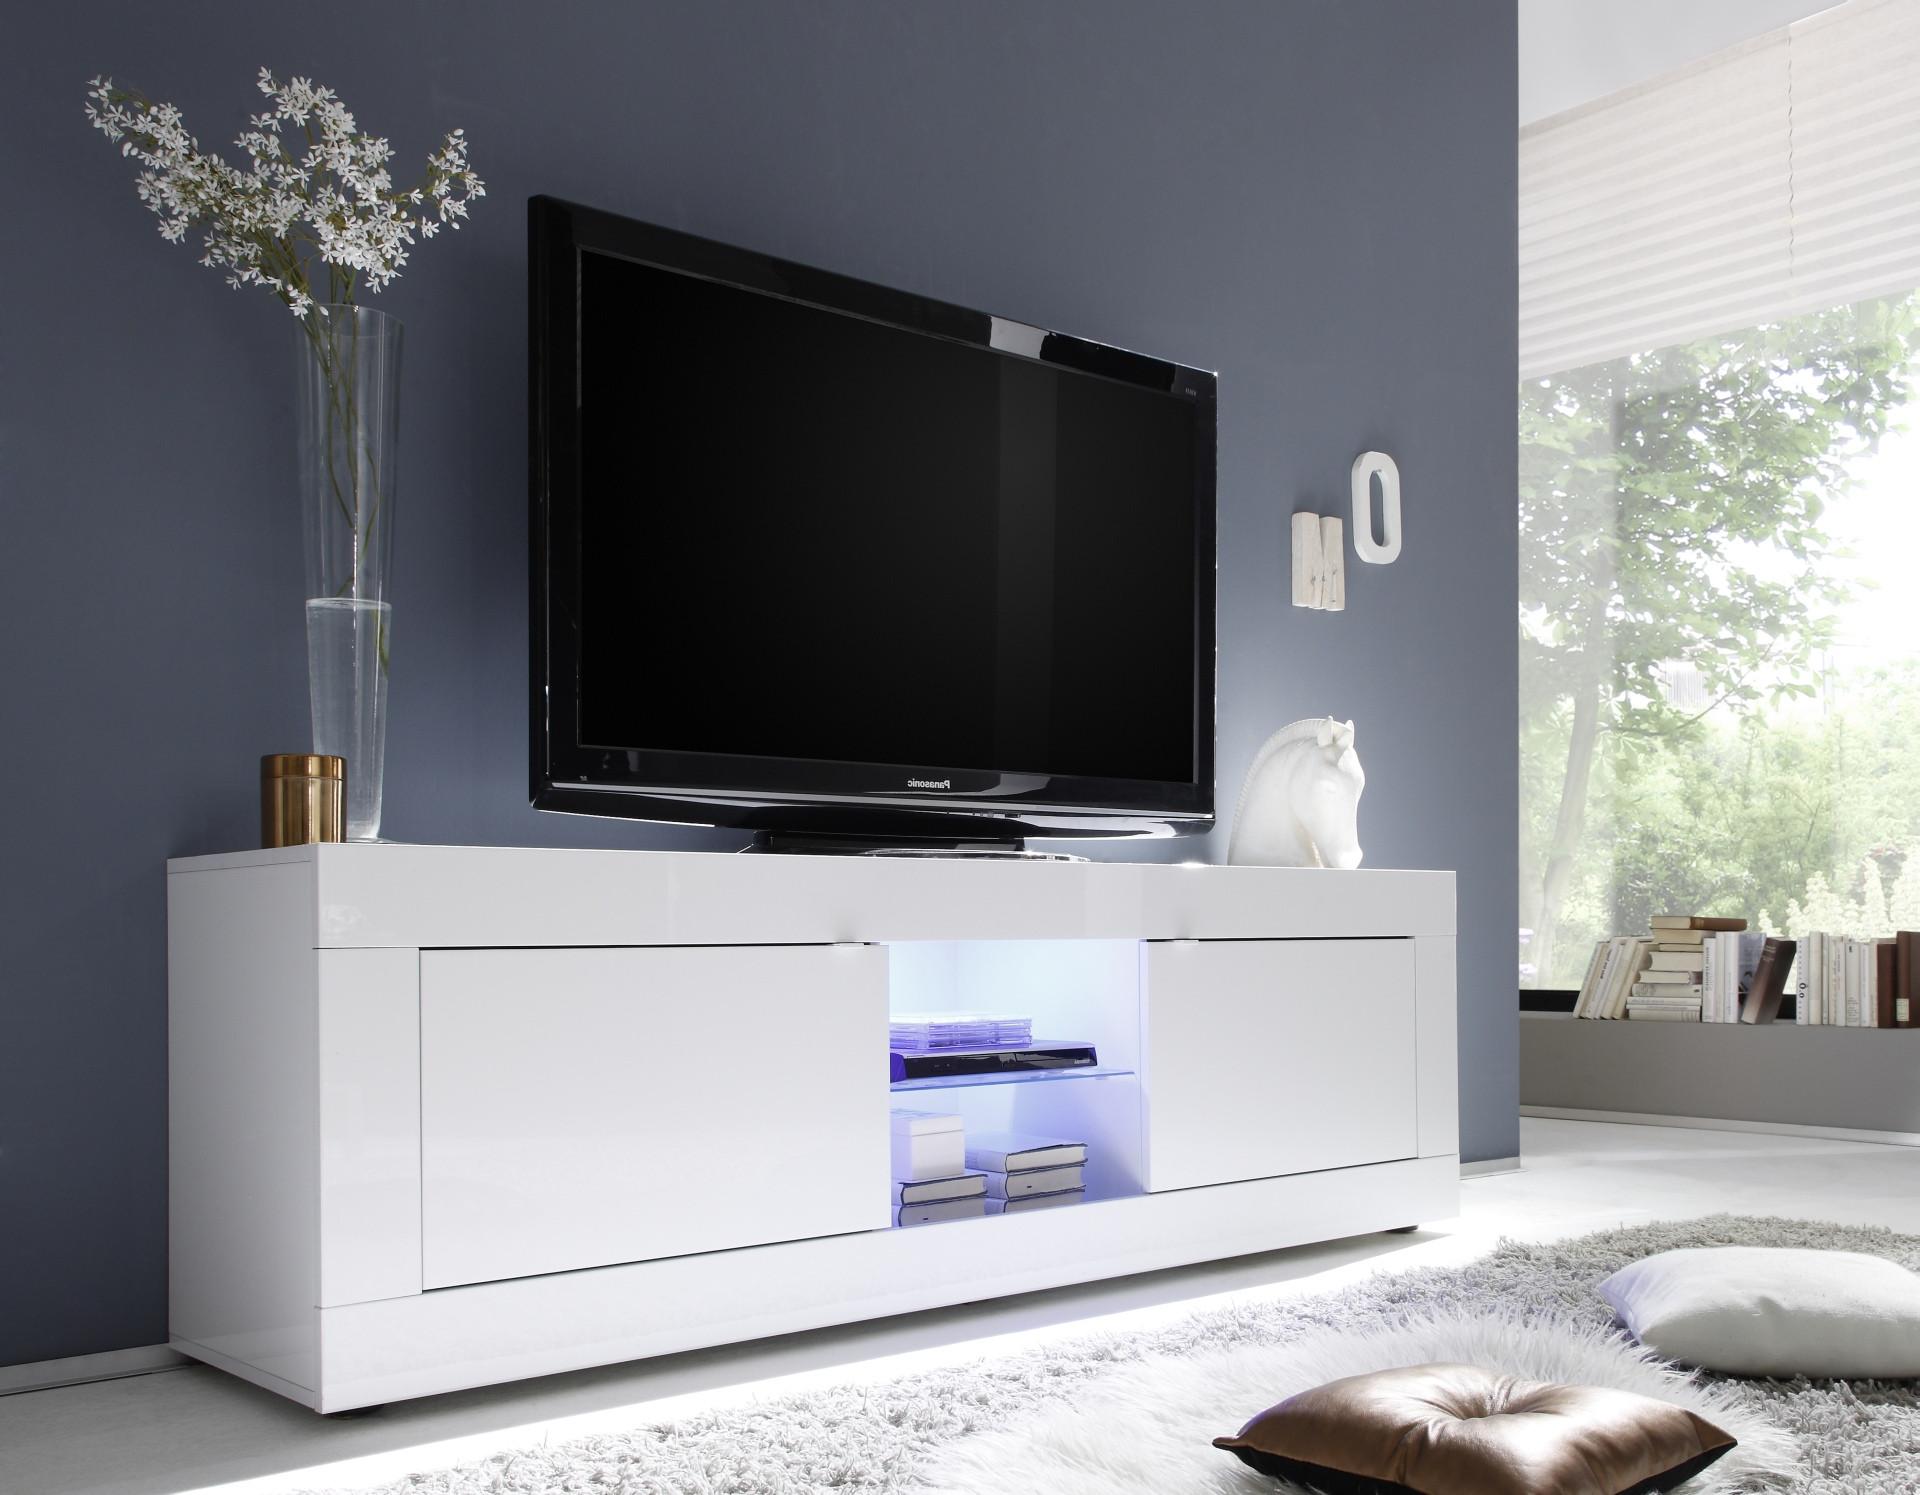 Meuble Blanc Laqué Brillant meuble tv grande 2 portes favara blanc laqué brillant blanc laqué brillant